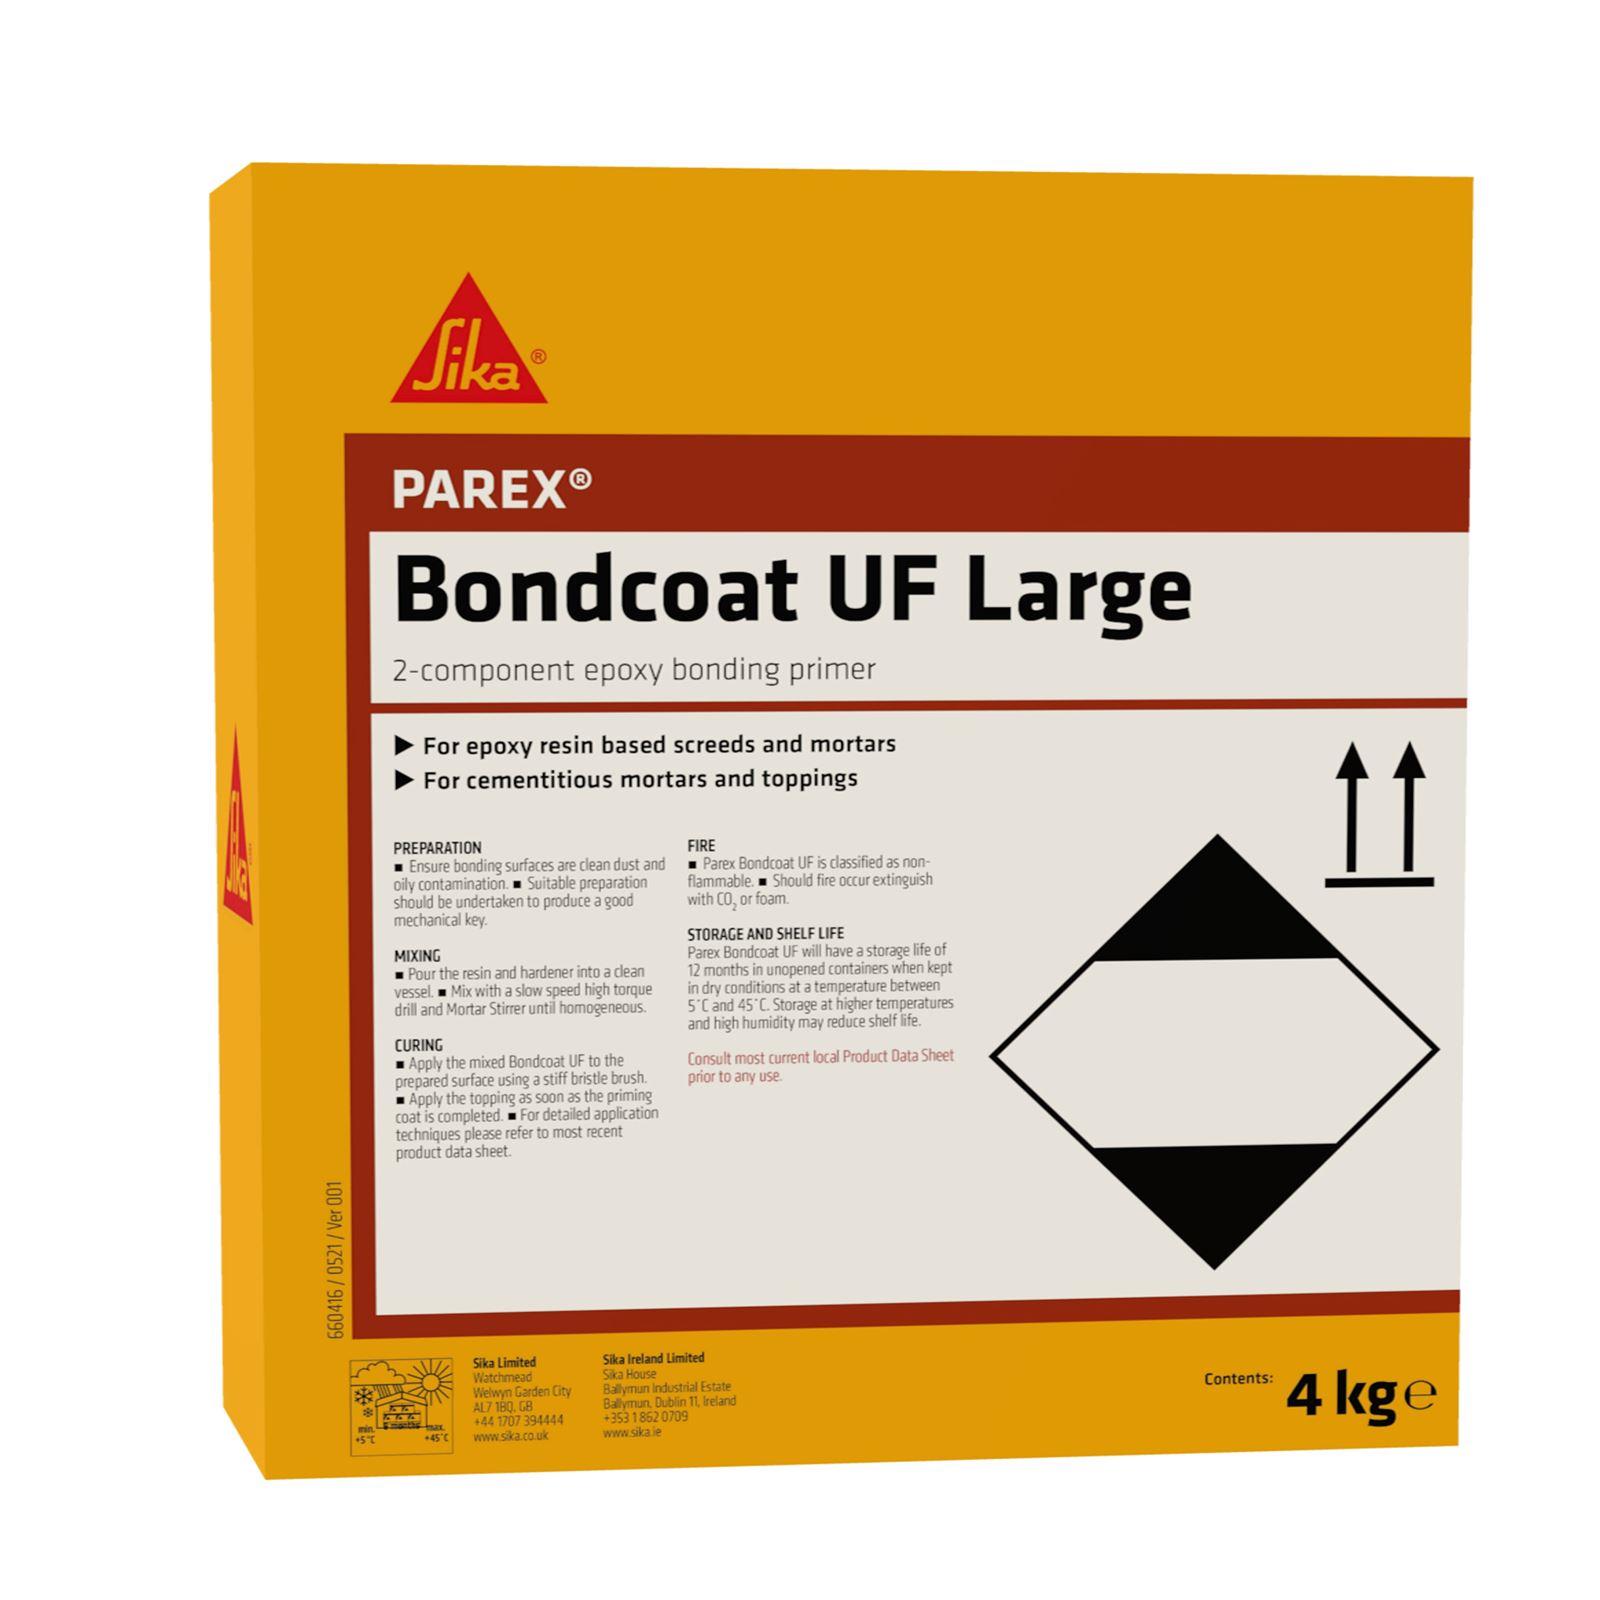 Parex Bondcoat UF (Large)